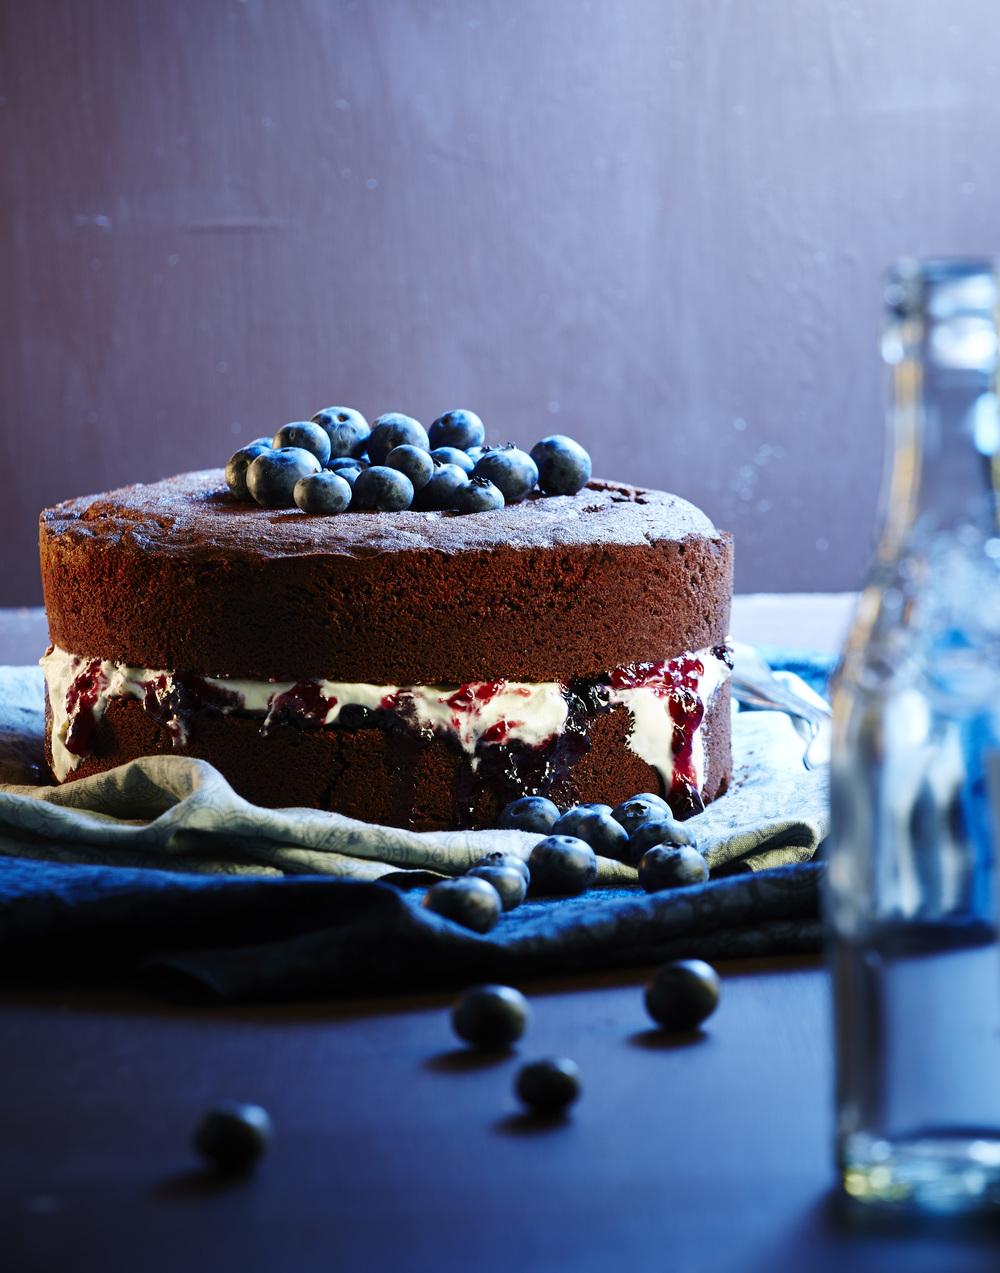 Blueberry cake-11x14-200dpi.jpg